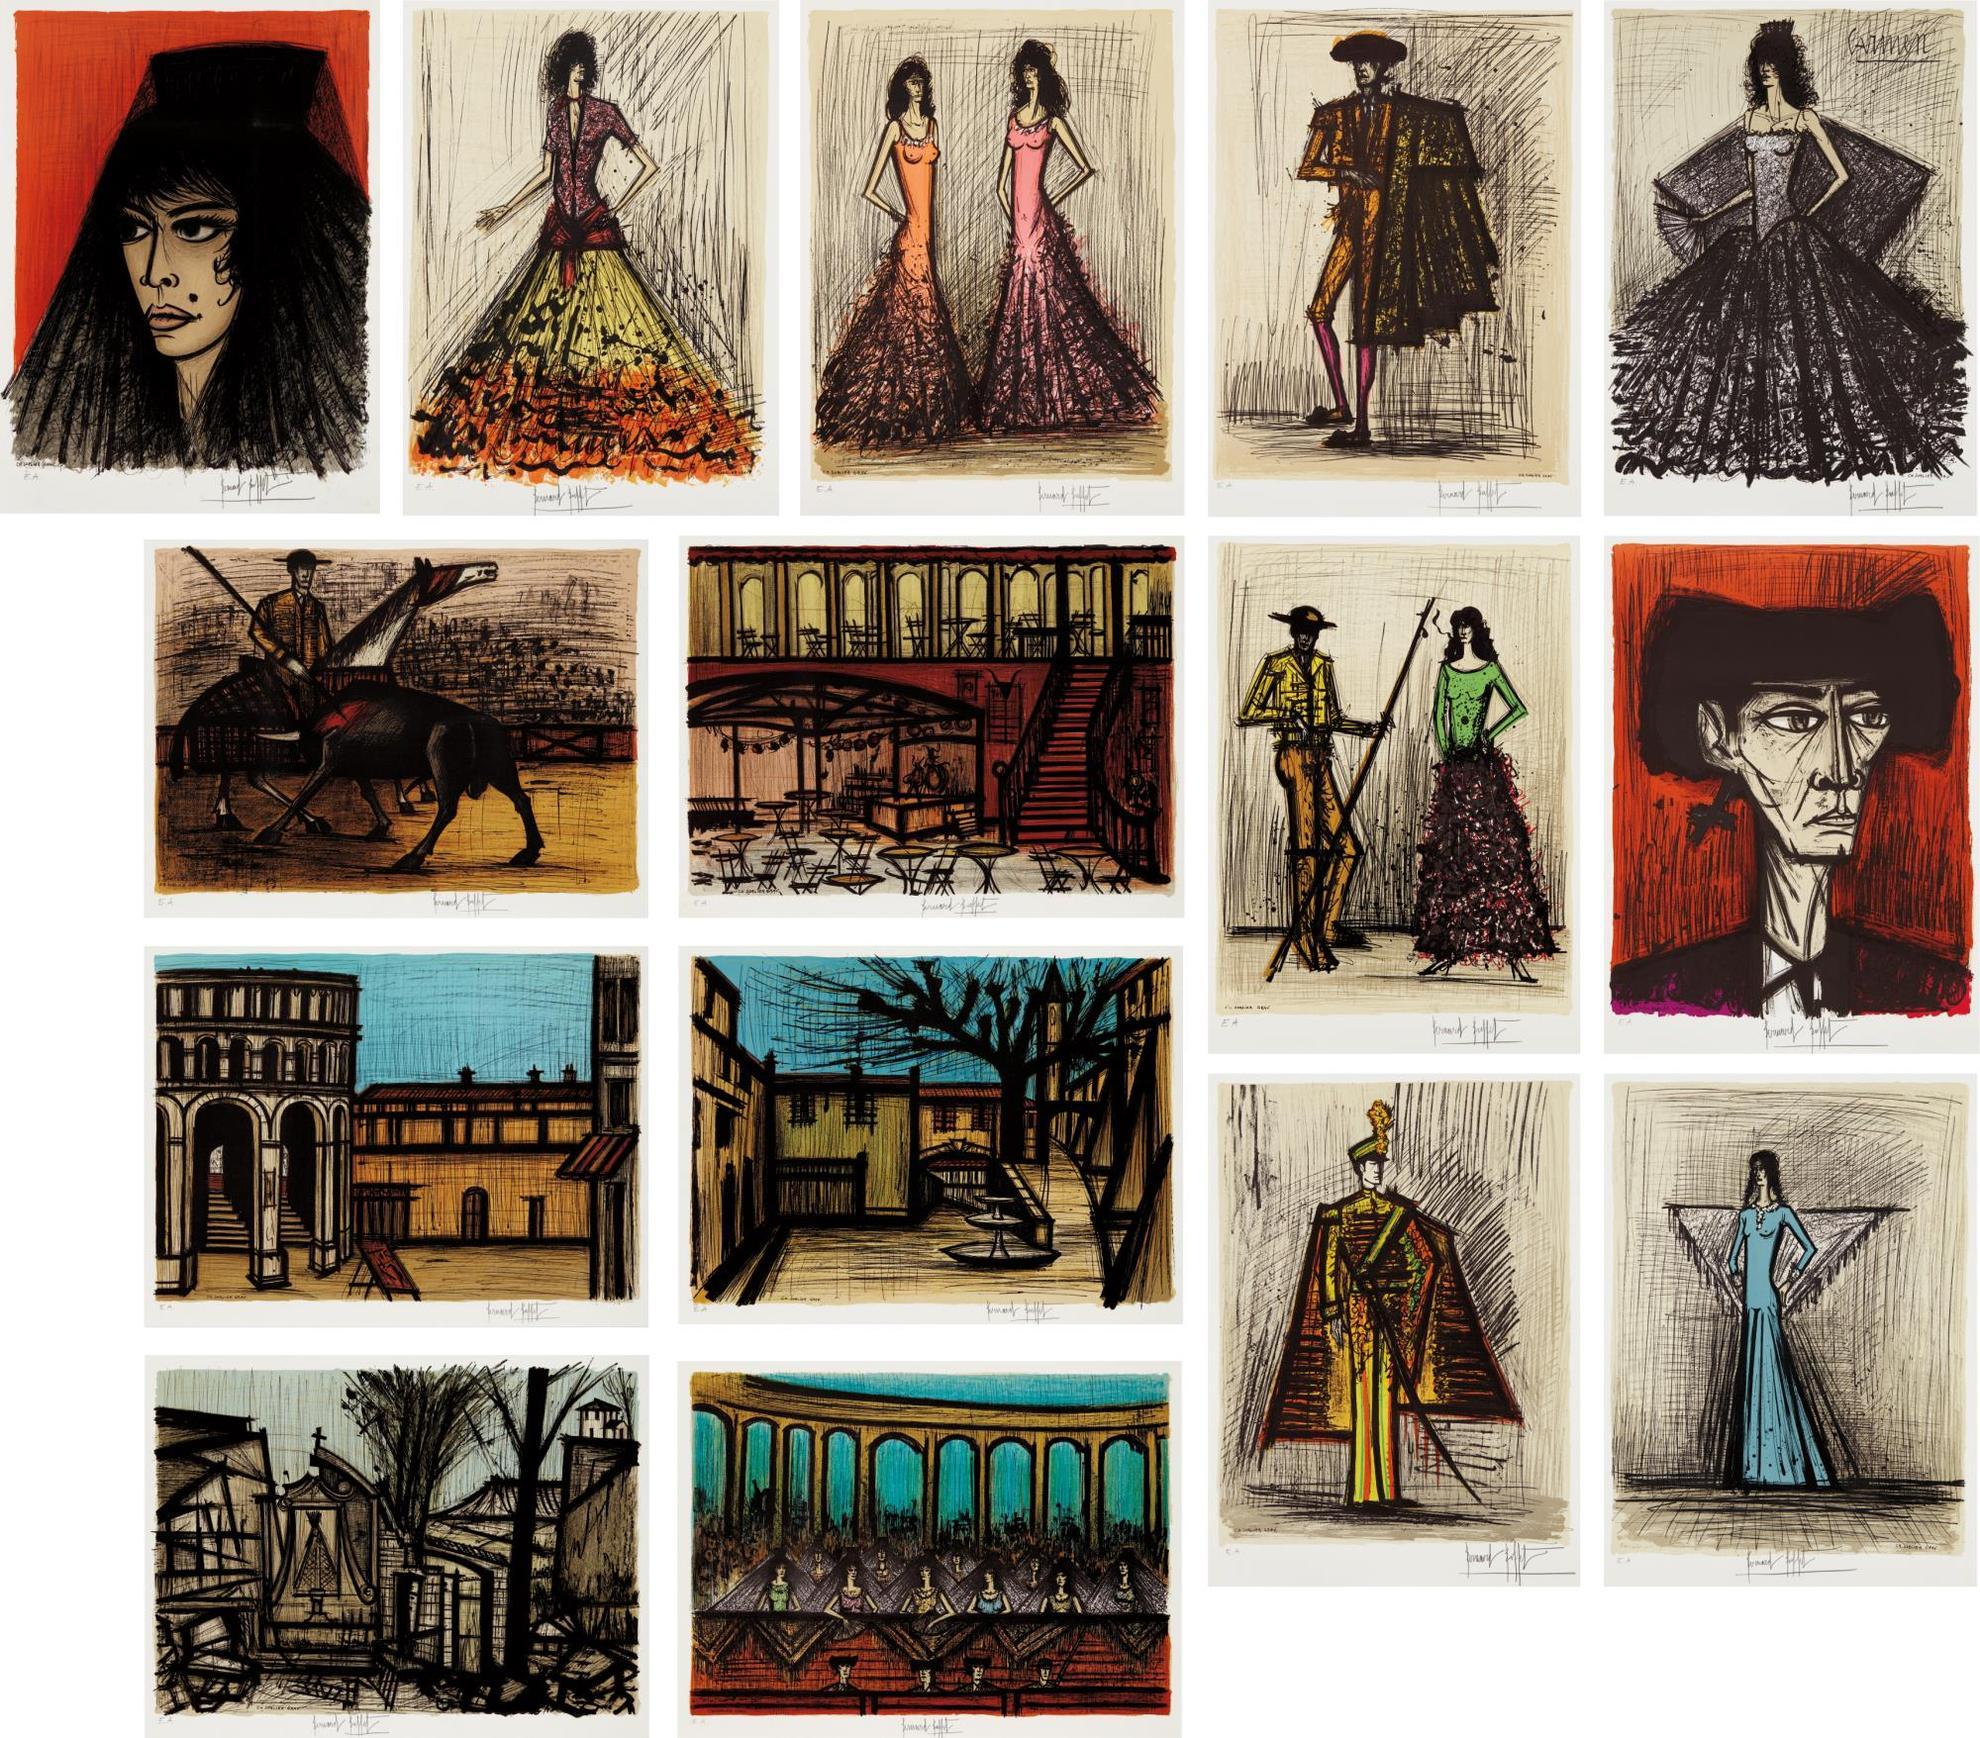 Bernard Buffet-Carmen, Decors Et Costumes (Carmen, Decorations And Costumes), By Charles Sorlier-1981